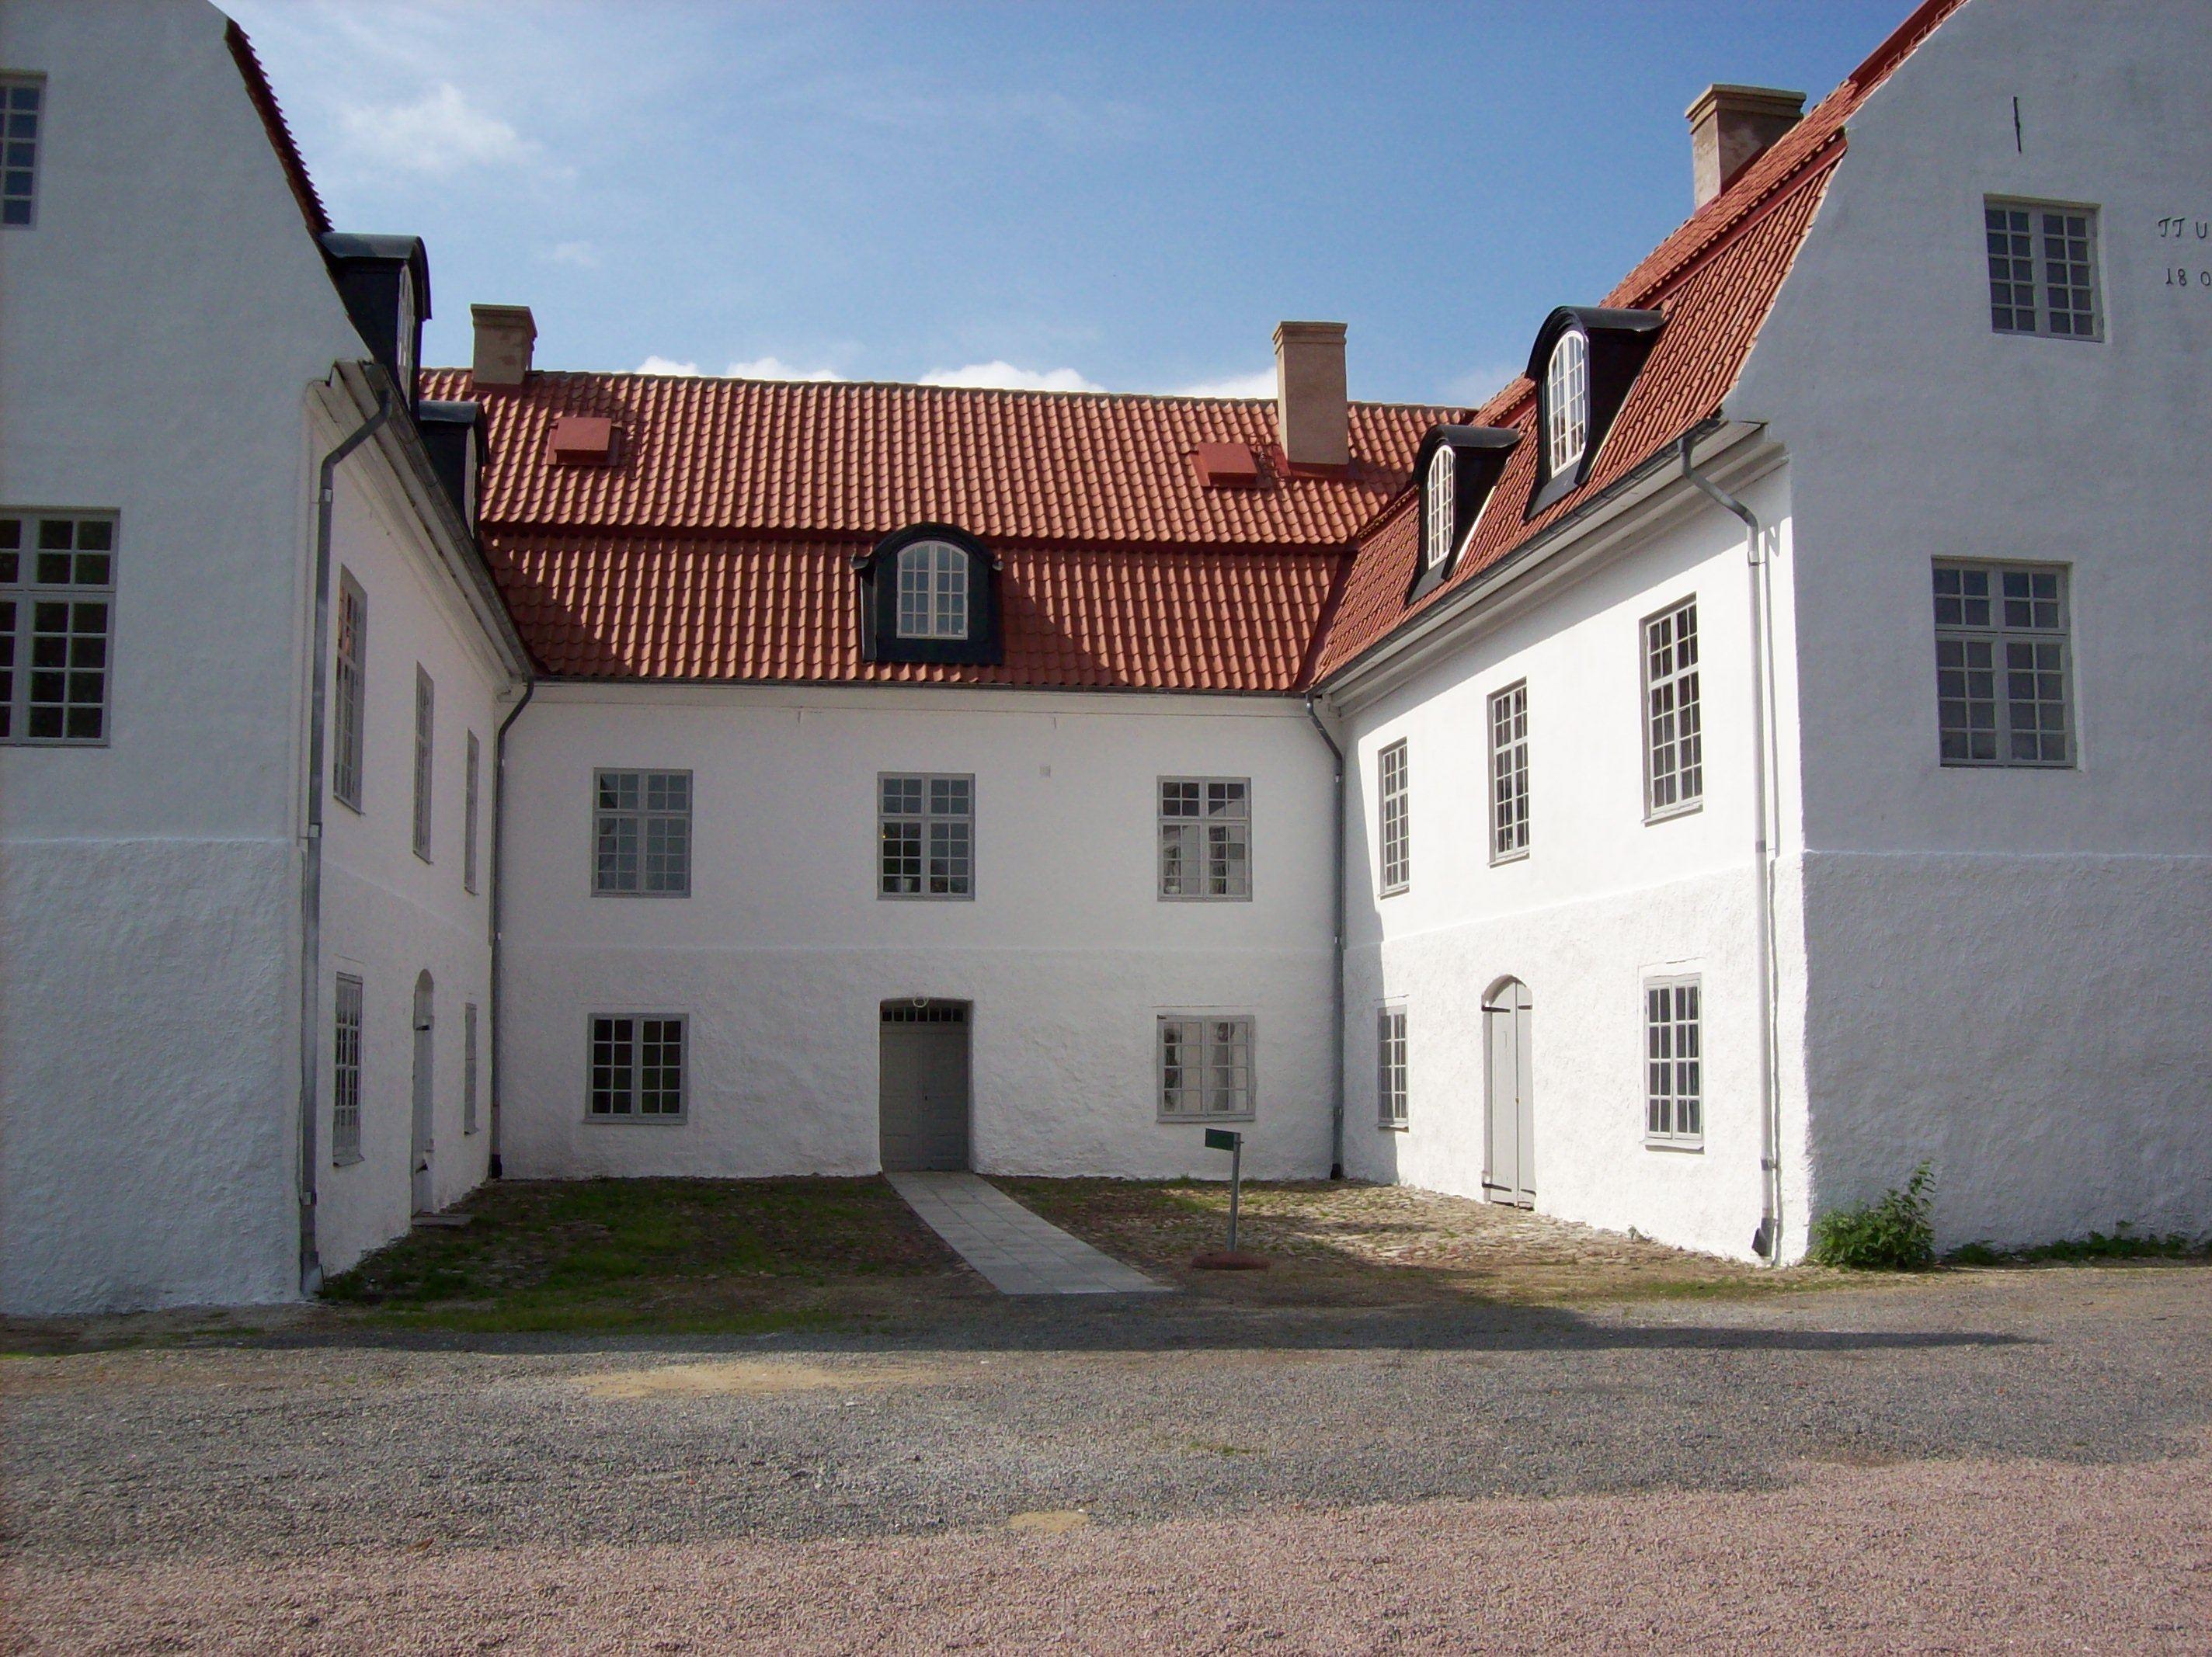 Kåseholm Manor